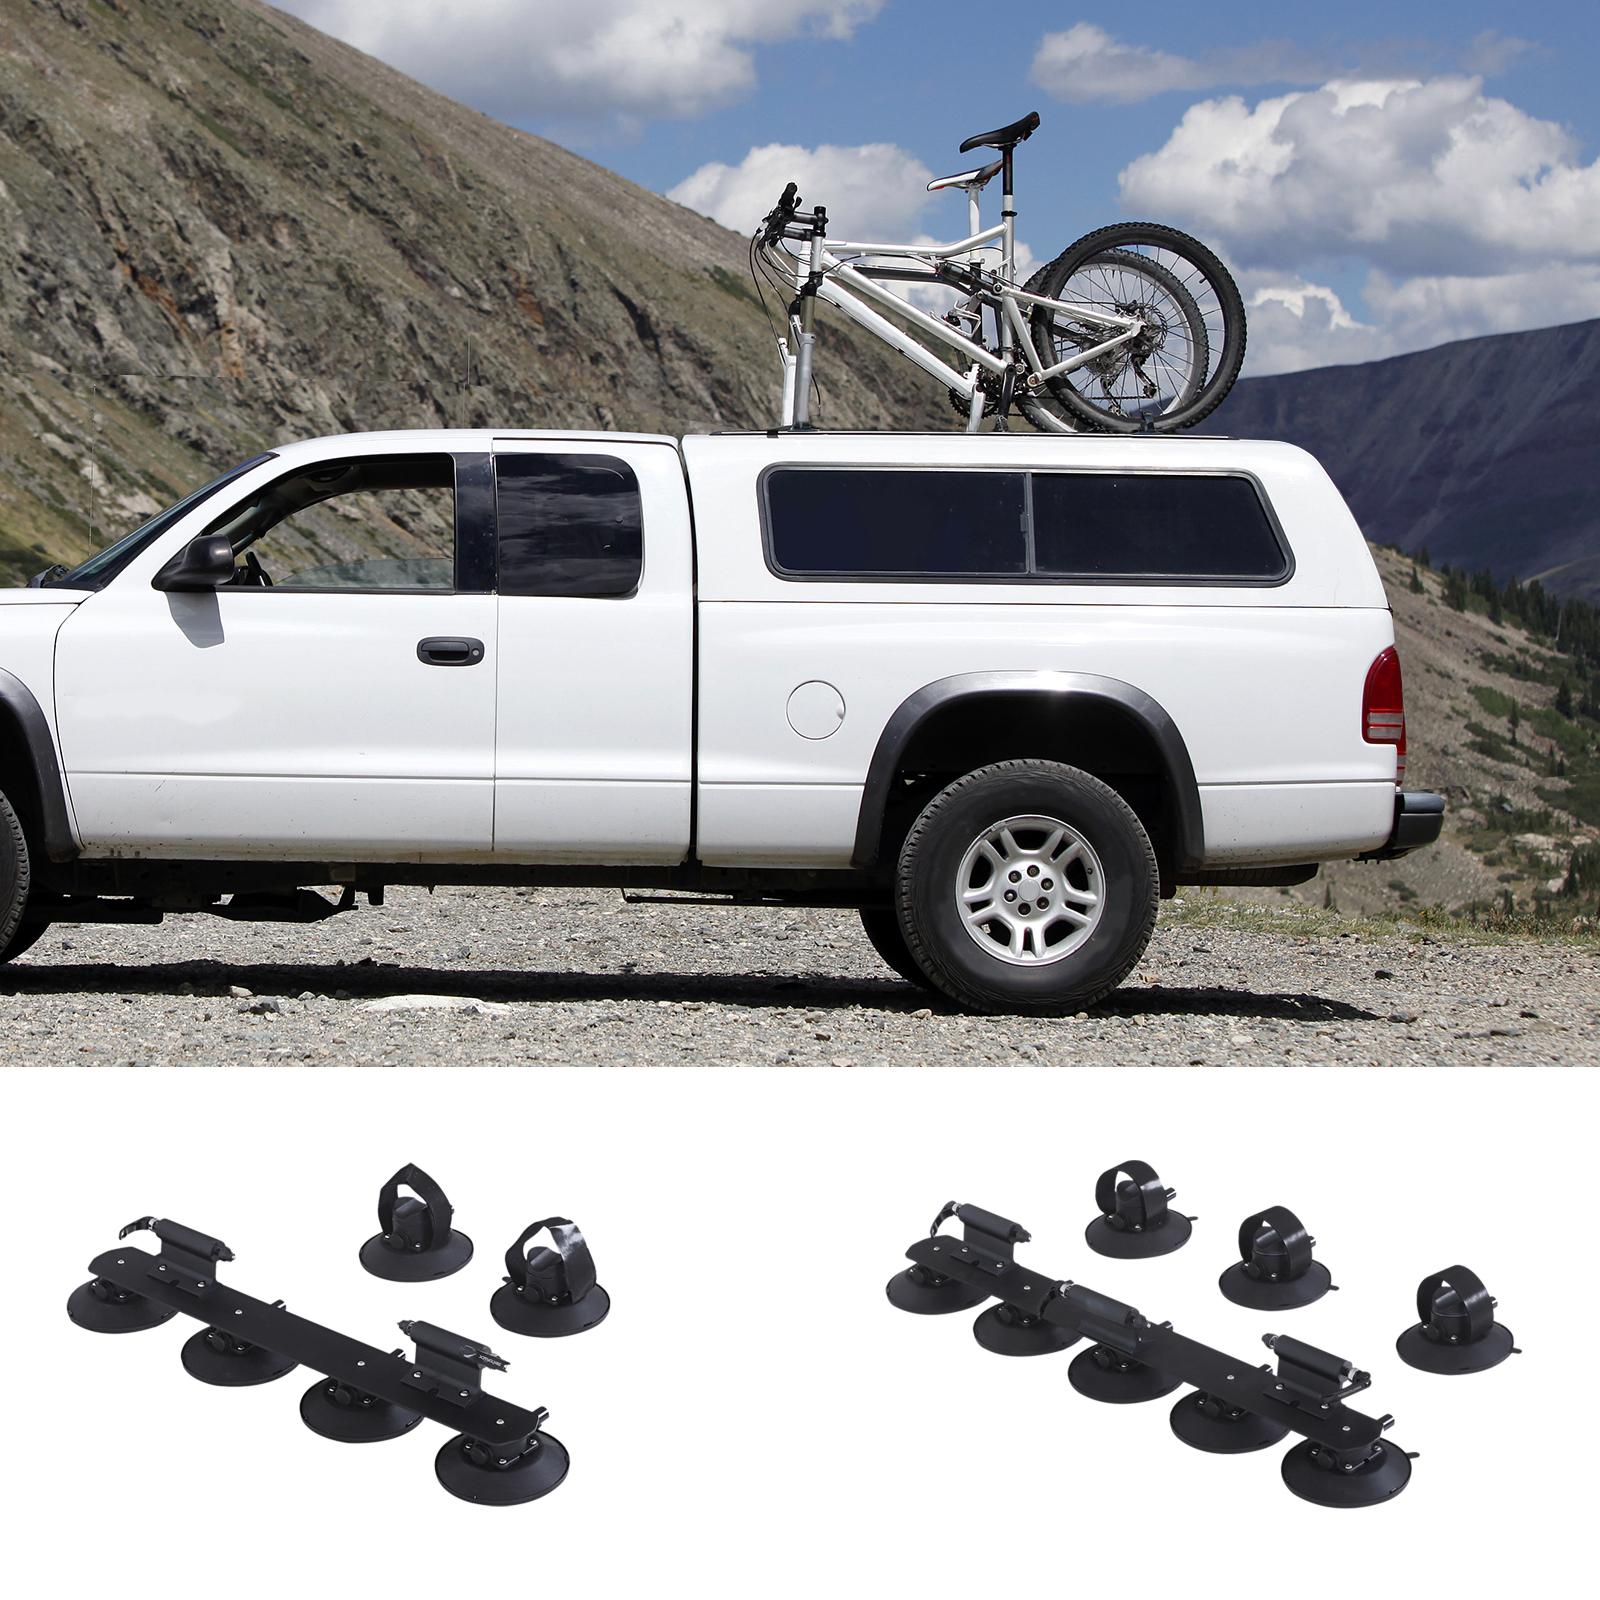 HOMCOM Fahrradträger Dachträger Fahrradhalter mit Saugnapf für 2//3 Fahrräder